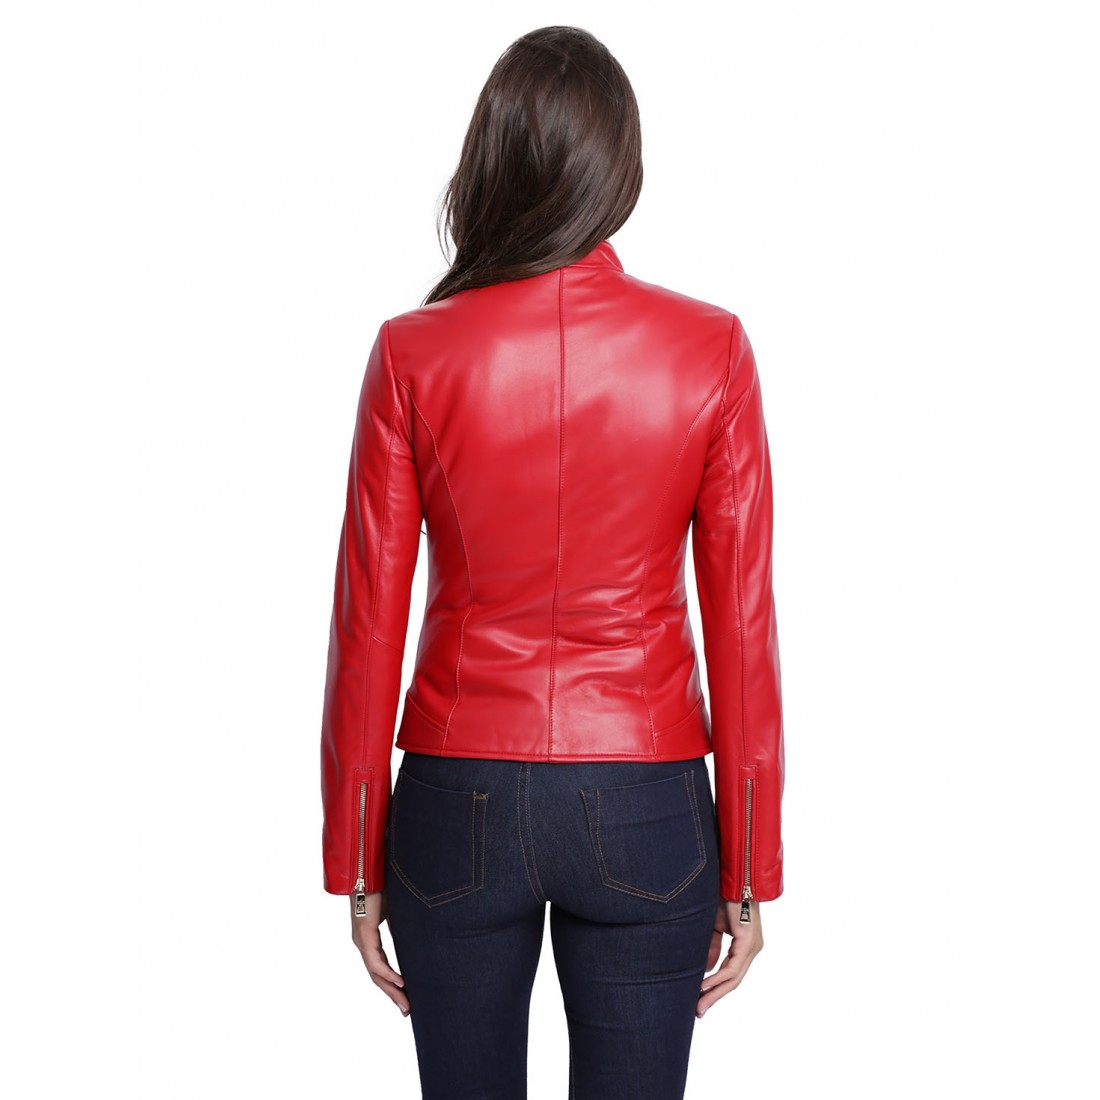 blouson cuir giovanni perry pour femme rouge. Black Bedroom Furniture Sets. Home Design Ideas